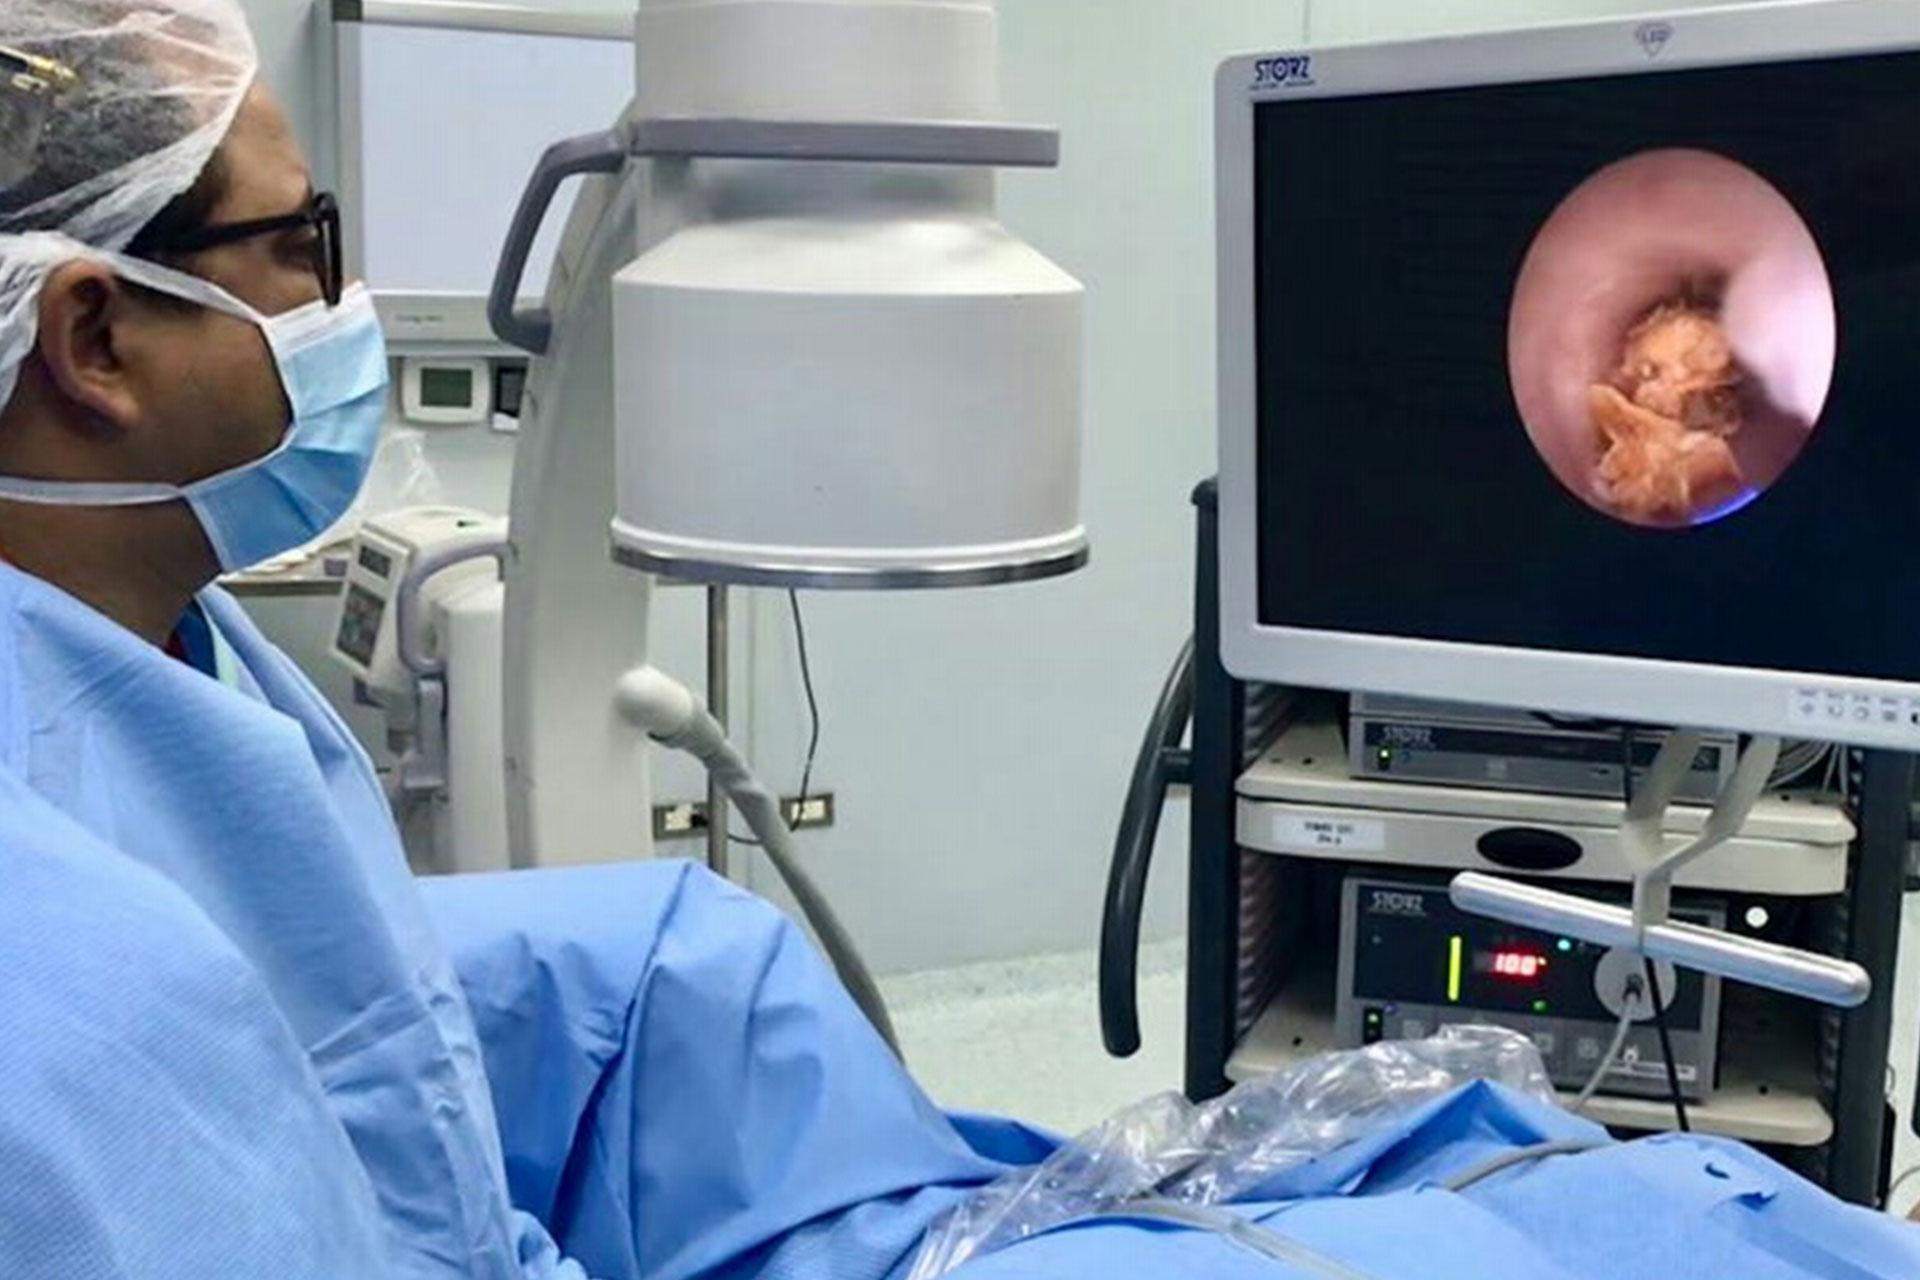 Cirugía Endoscópica Urológica